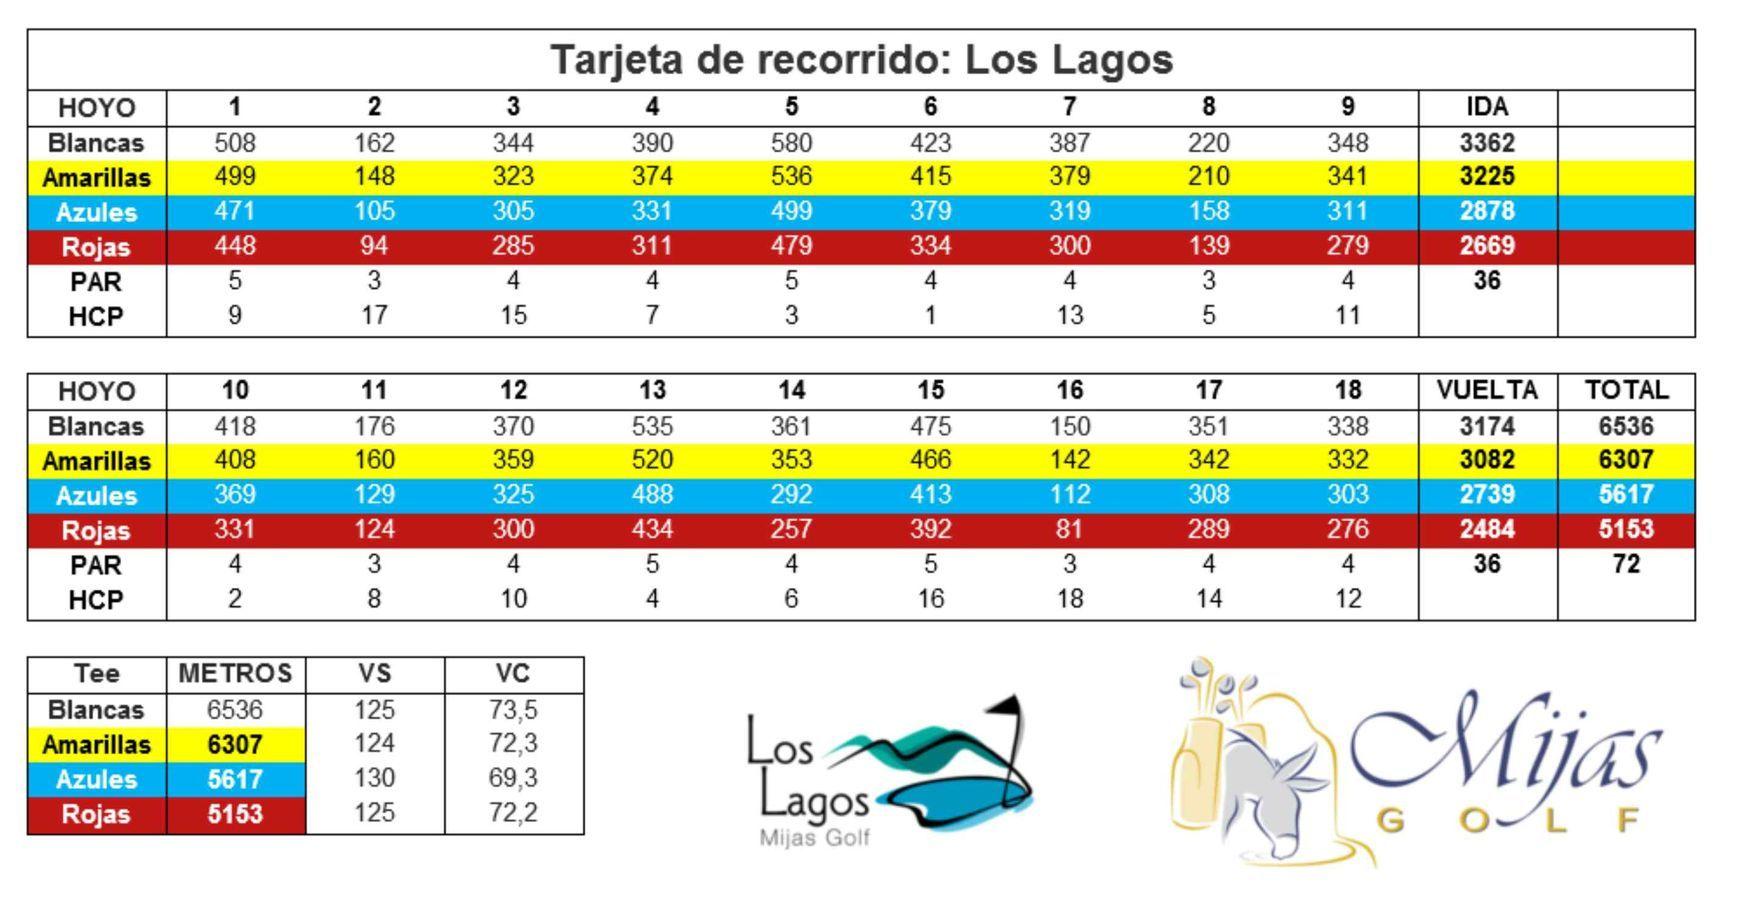 Tarjeta de Recorrido Los Lagos